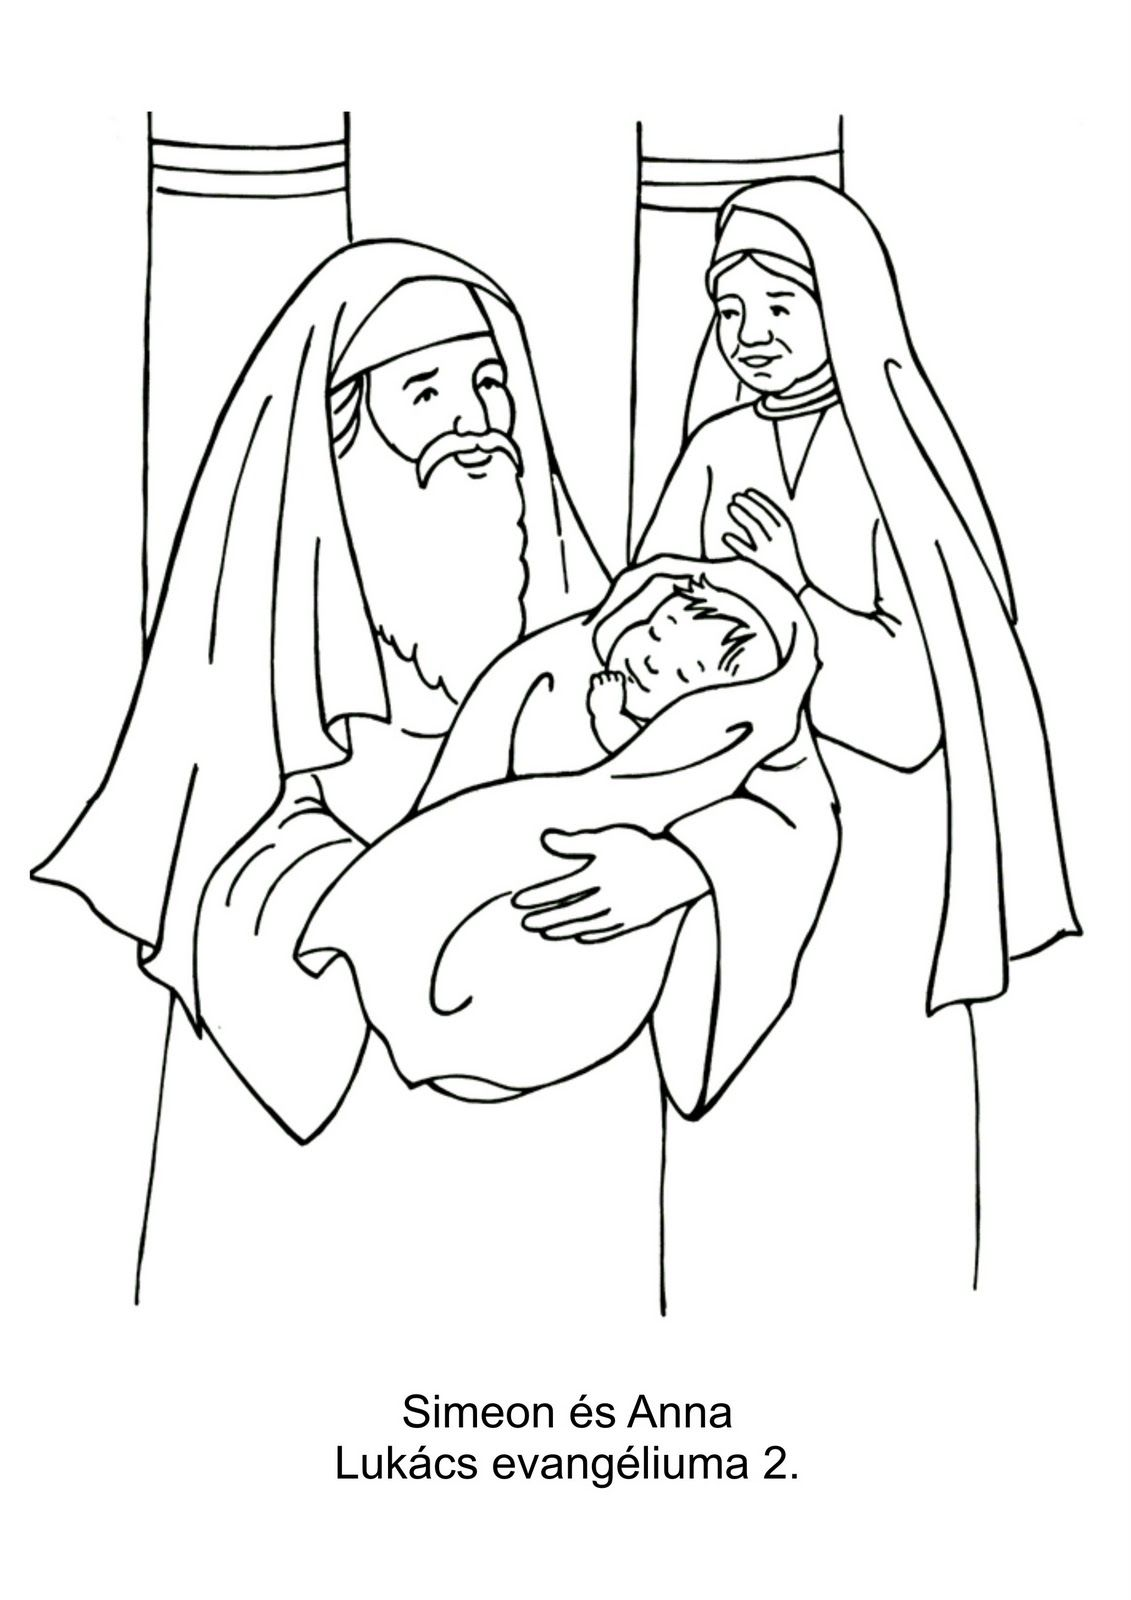 Simeon en Anna | Sunday school | Pinterest | Children church ...